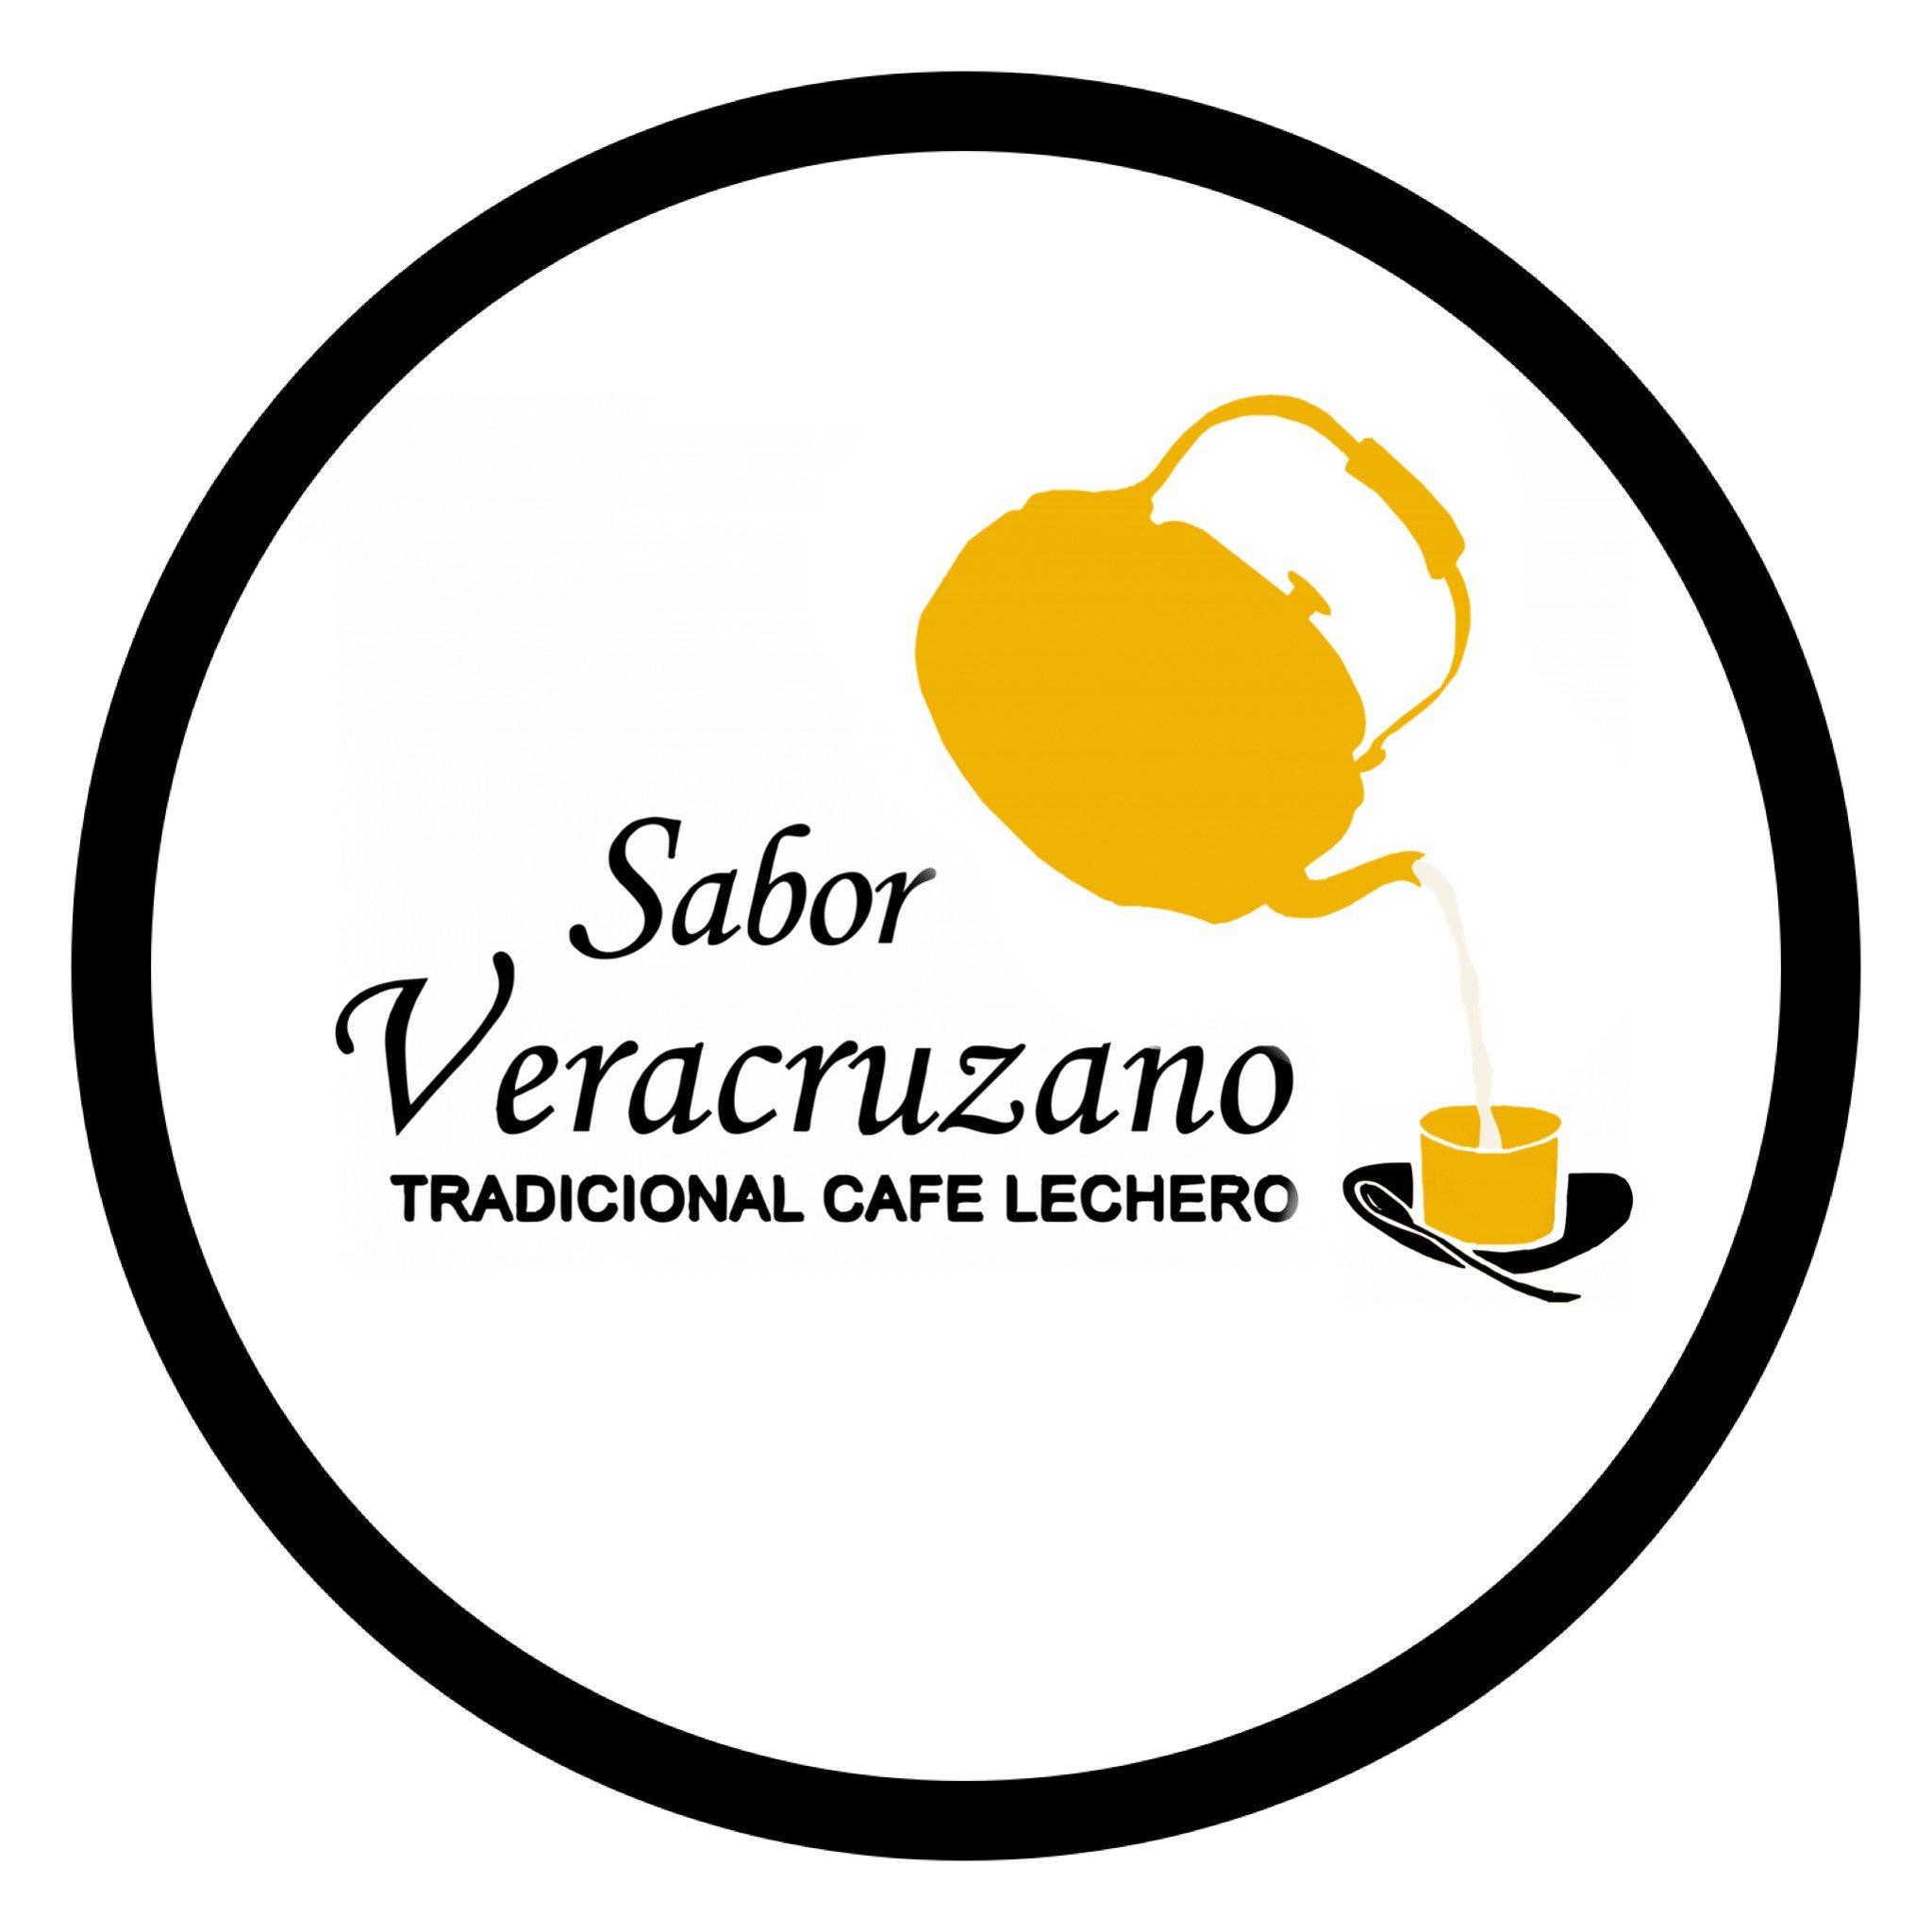 Sabor Veracruzano